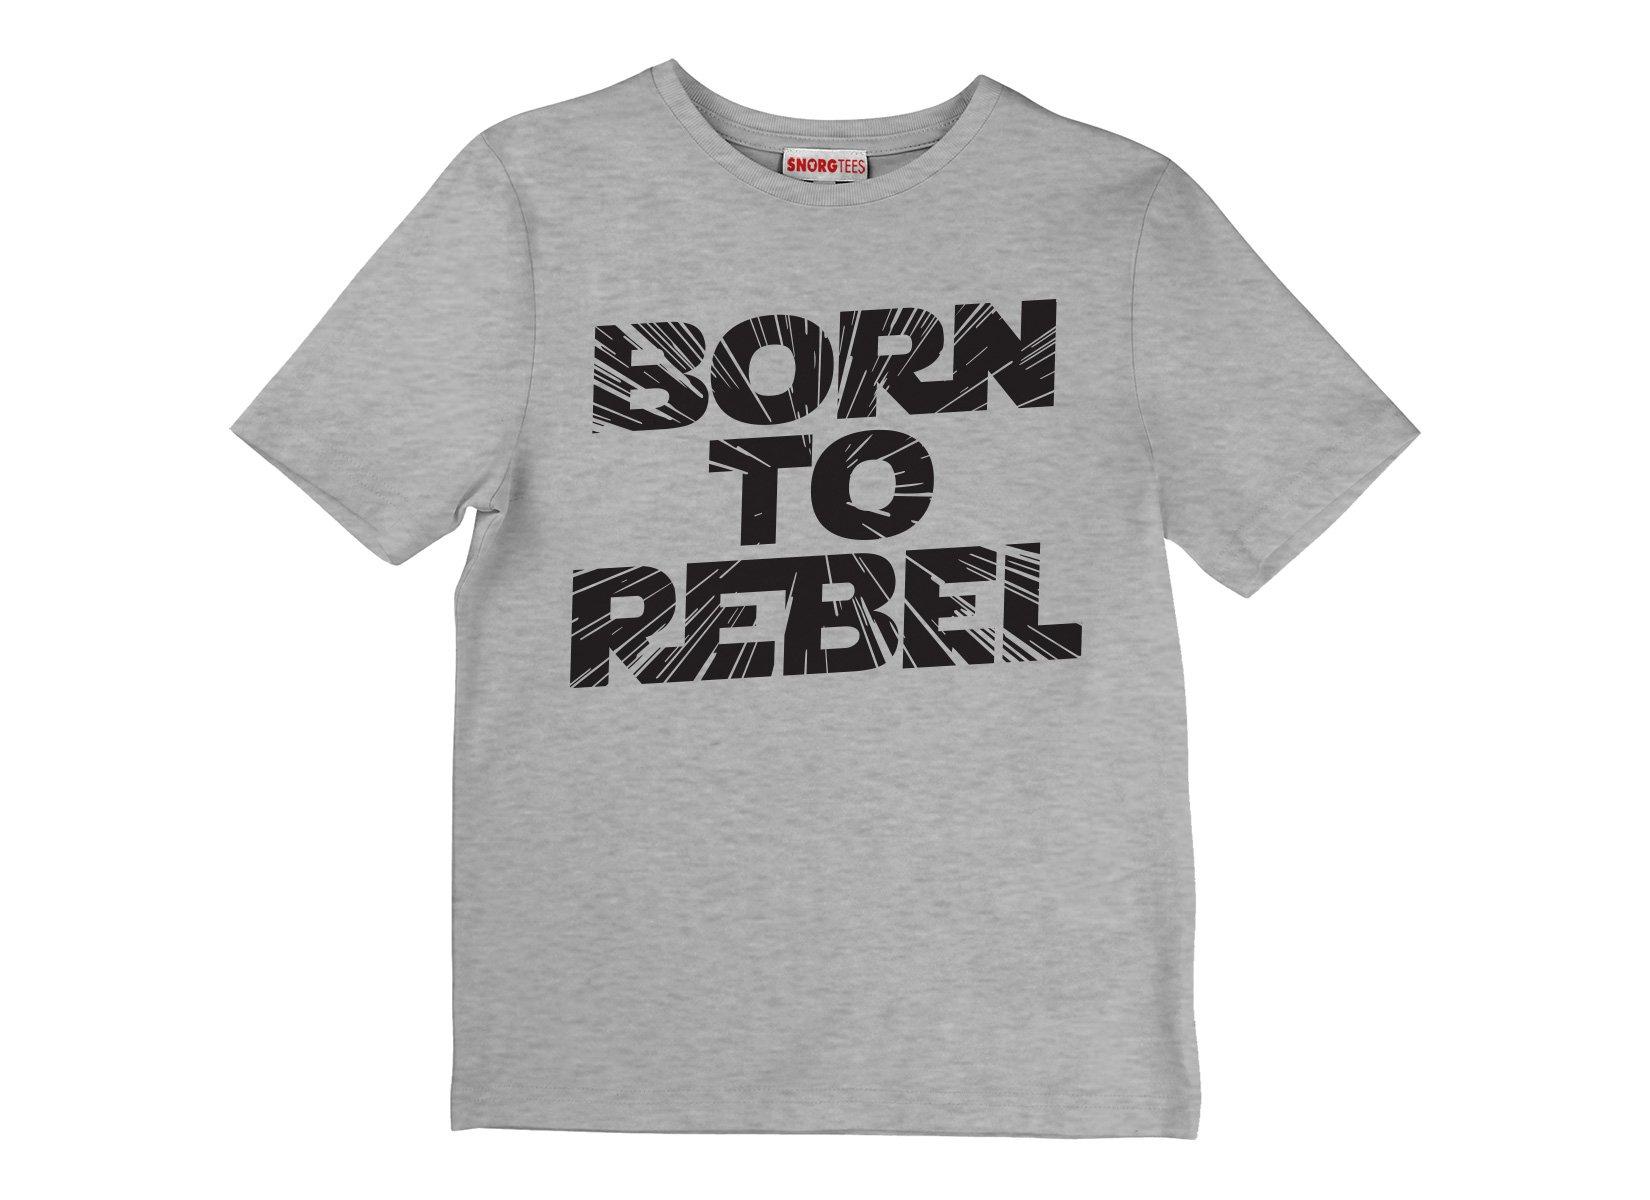 Born To Rebel on Kids T-Shirt